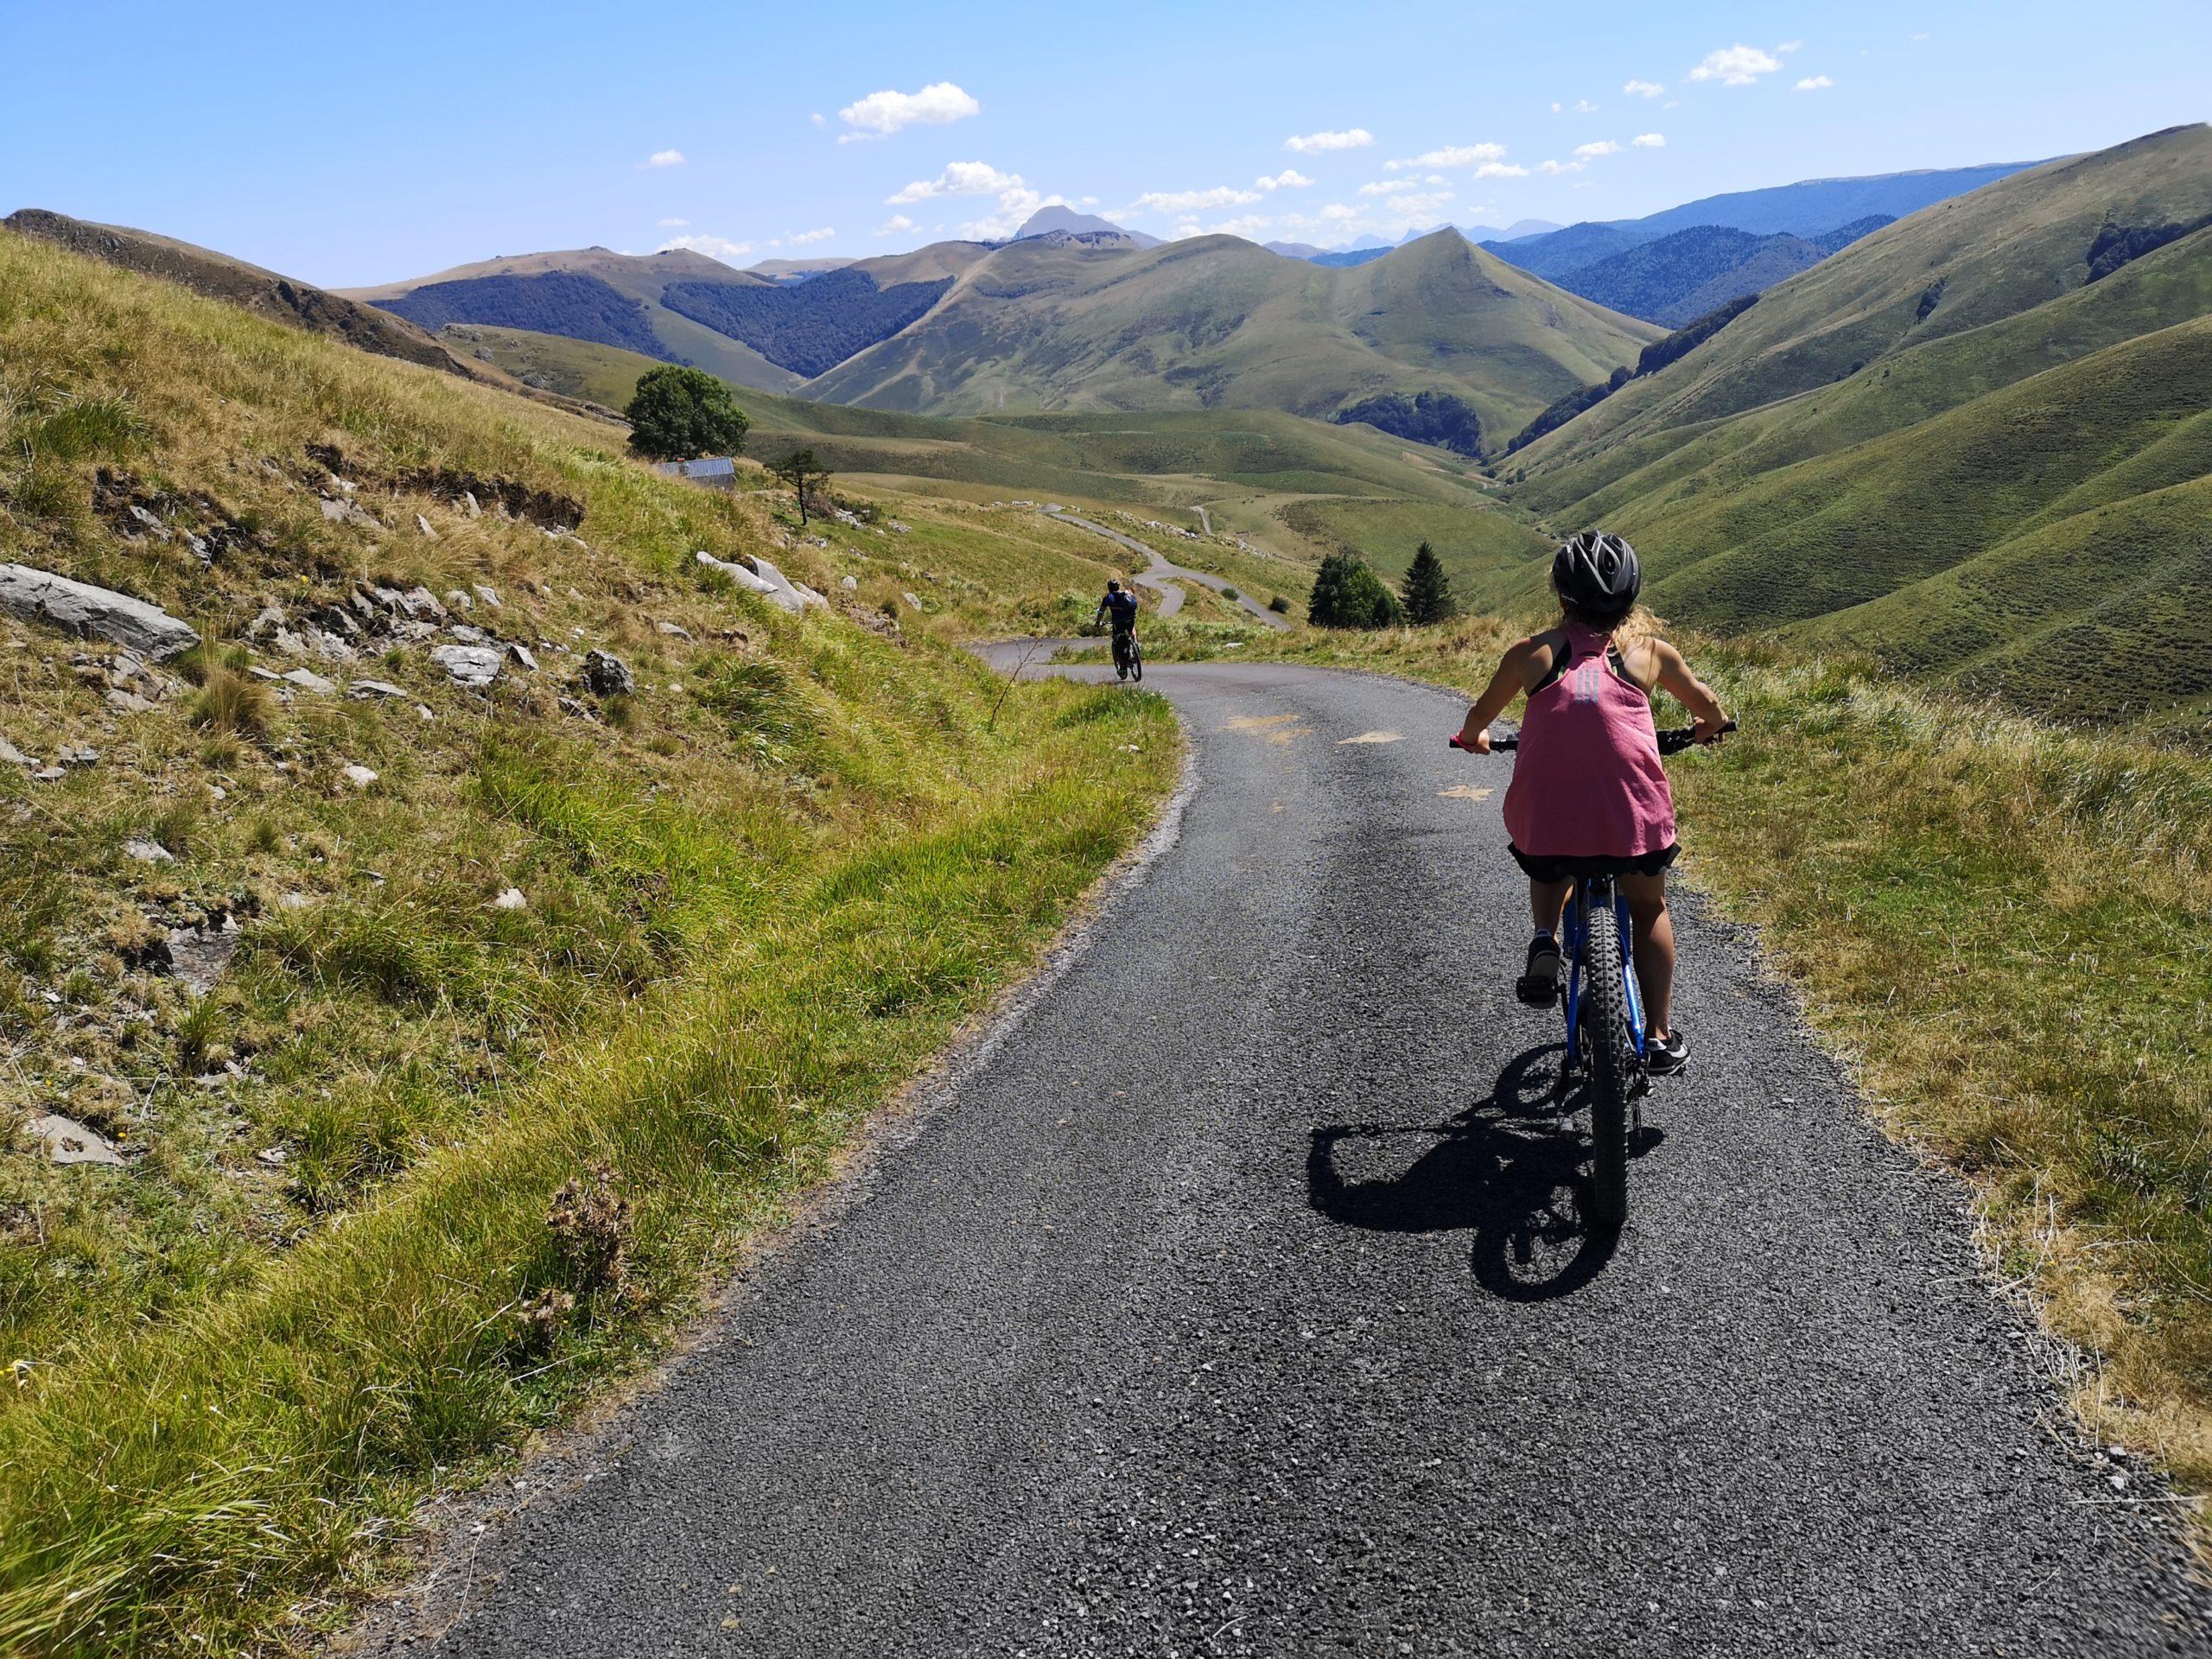 Irati e-bike